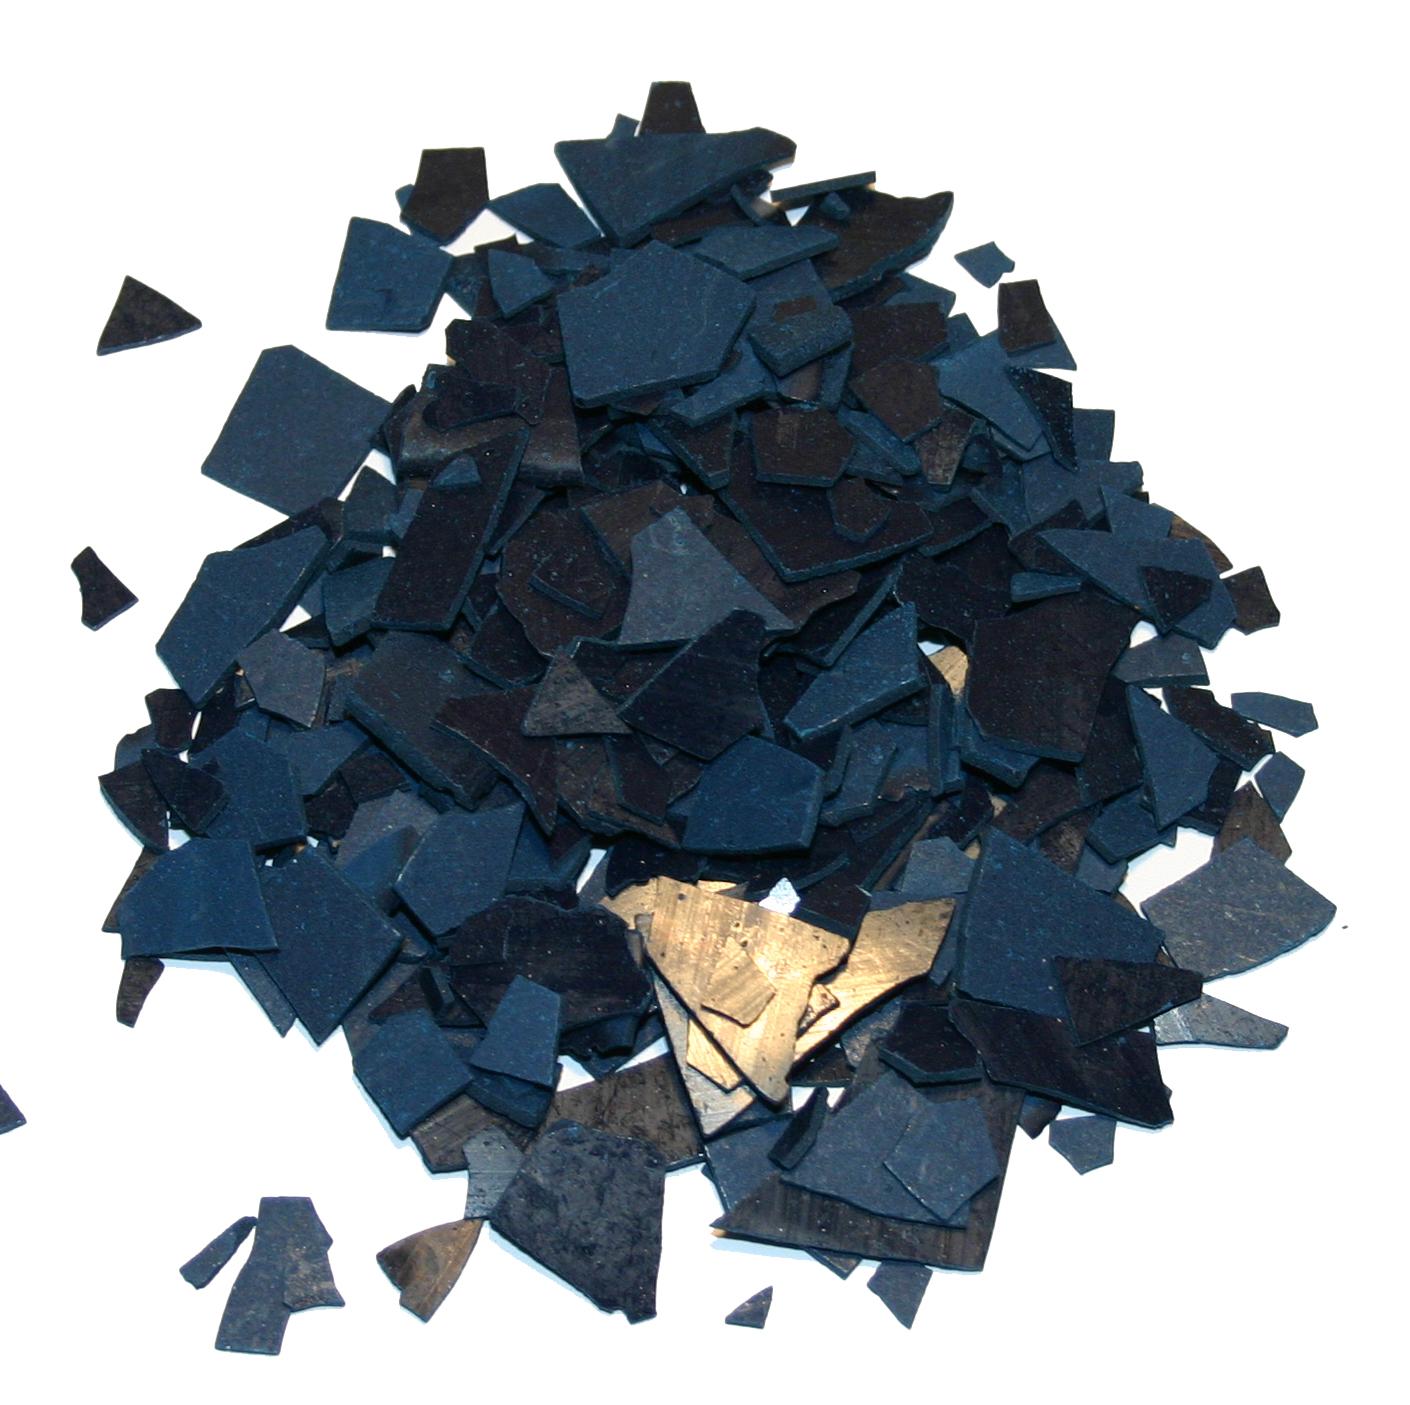 kerzenfarbe pigment ozeanblau t rkis farben kerzengiessen. Black Bedroom Furniture Sets. Home Design Ideas